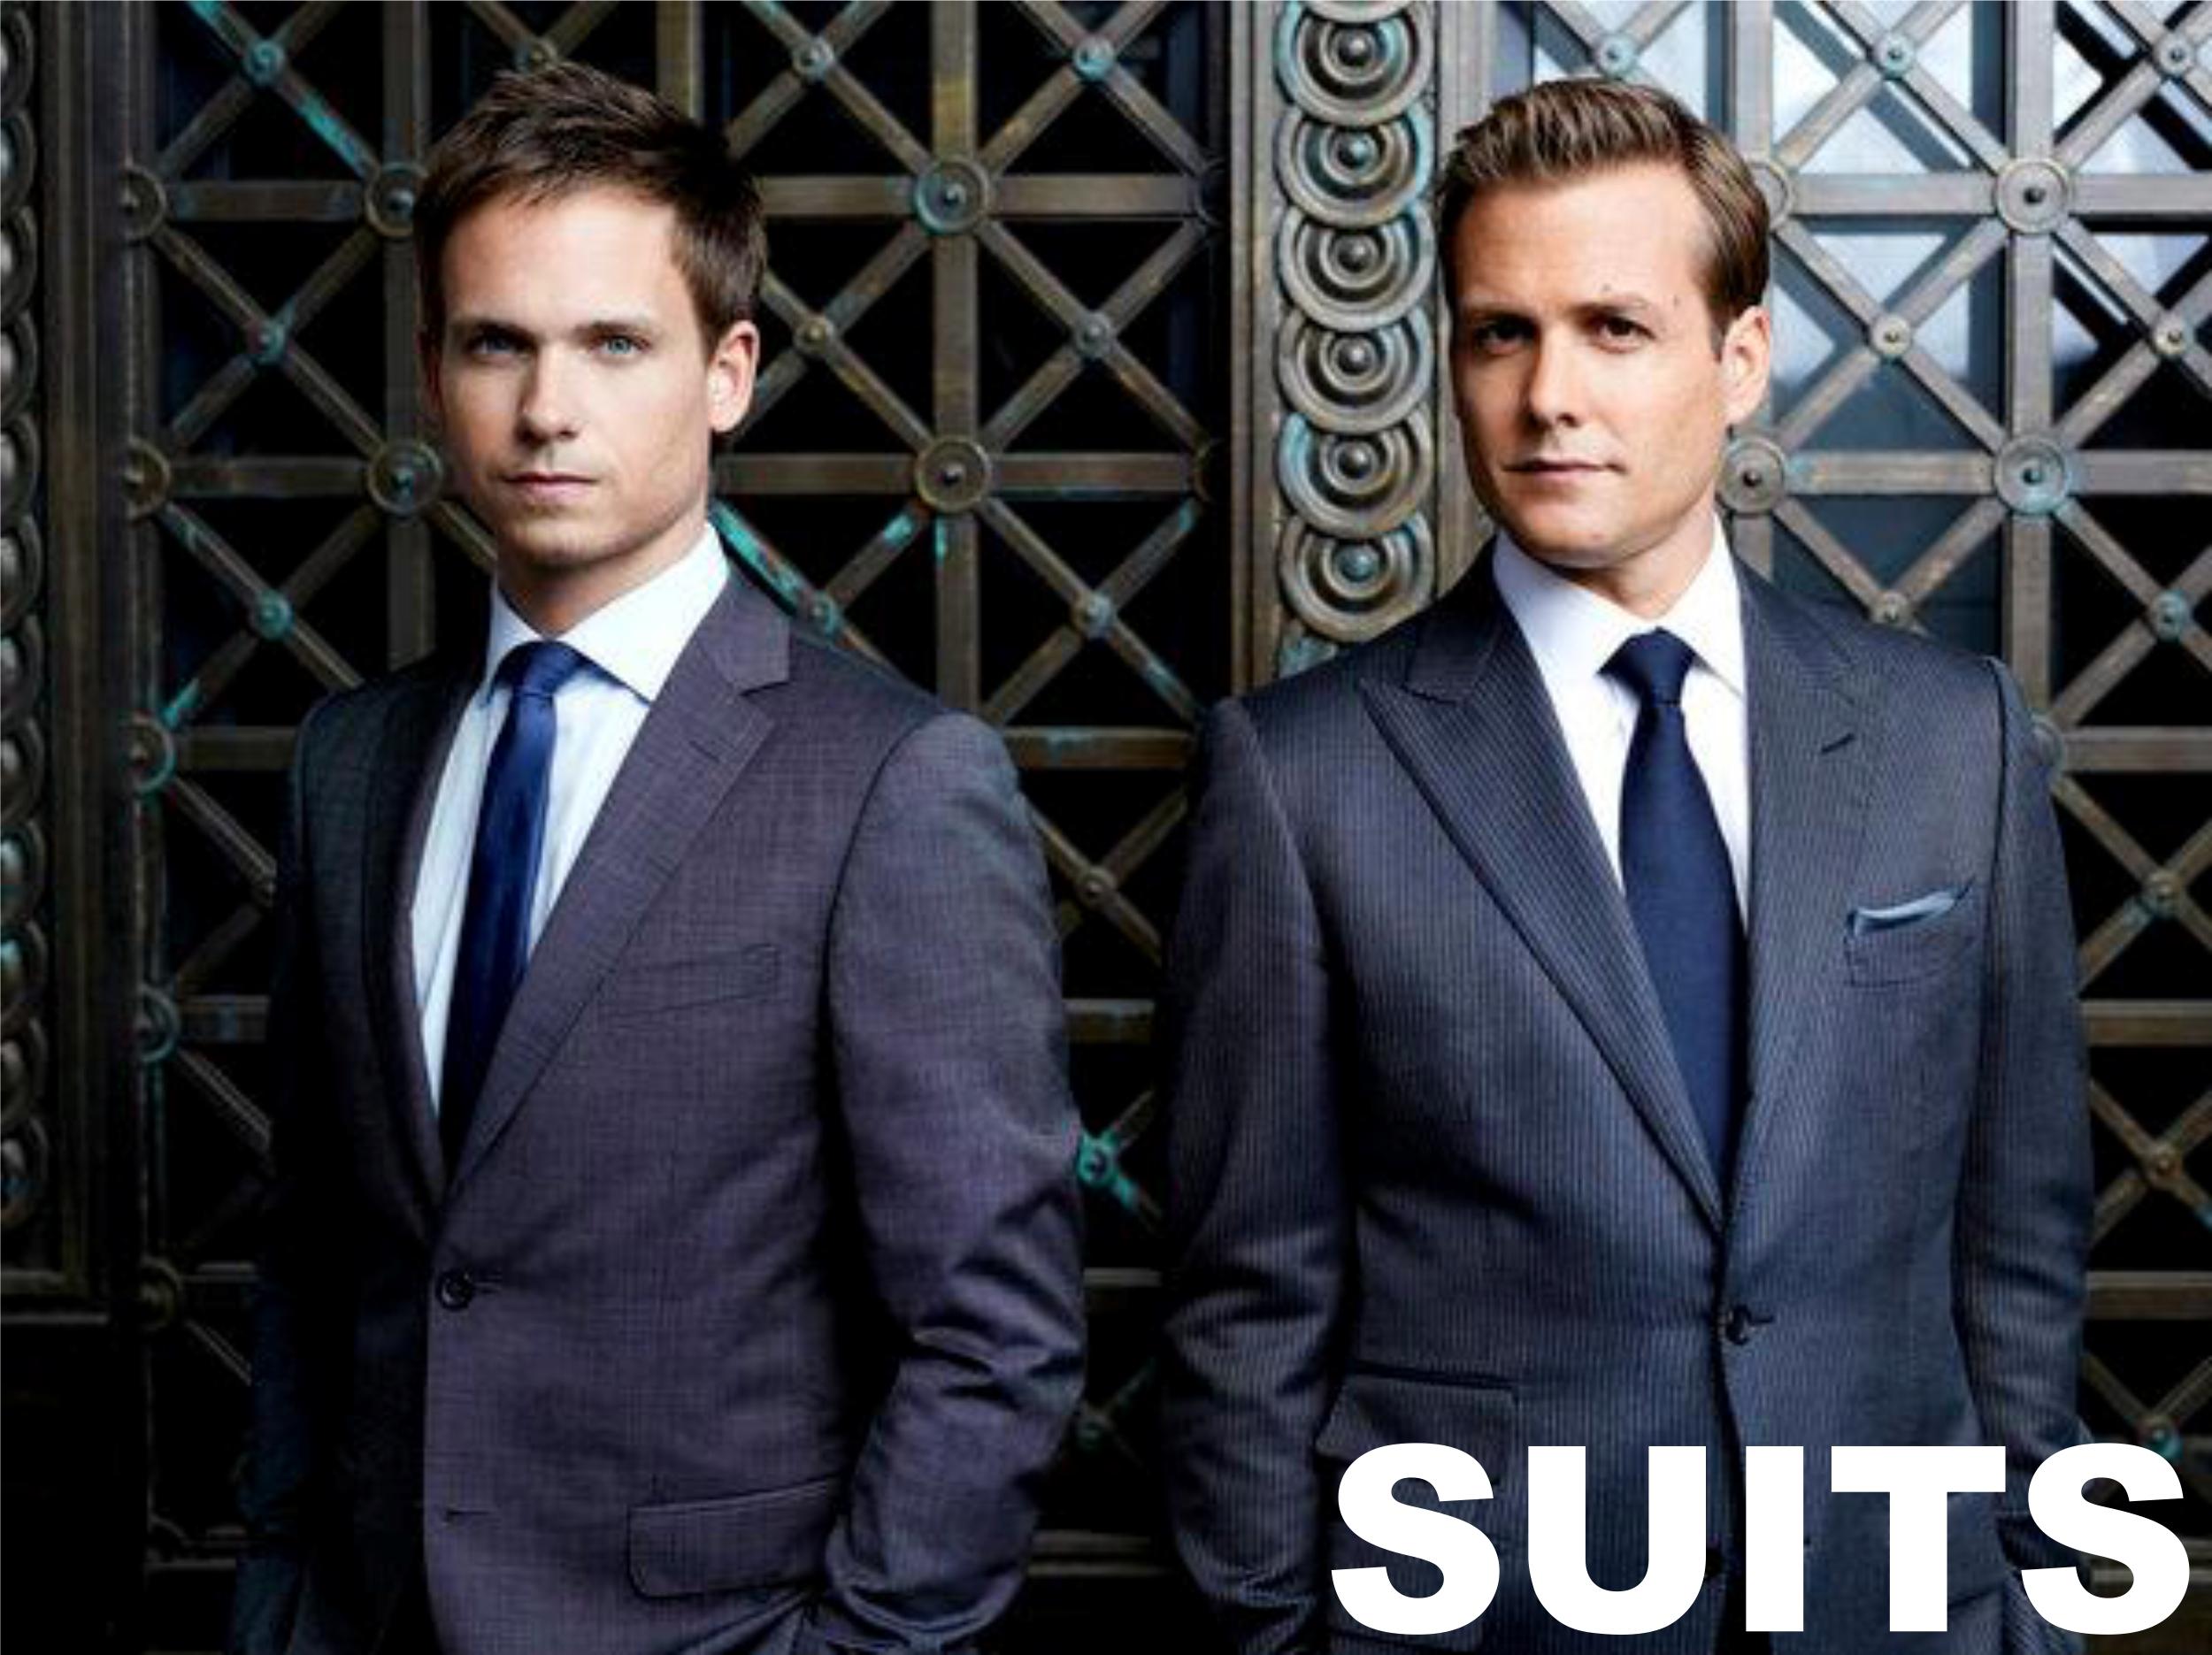 Suits - W garniturach tapeta2